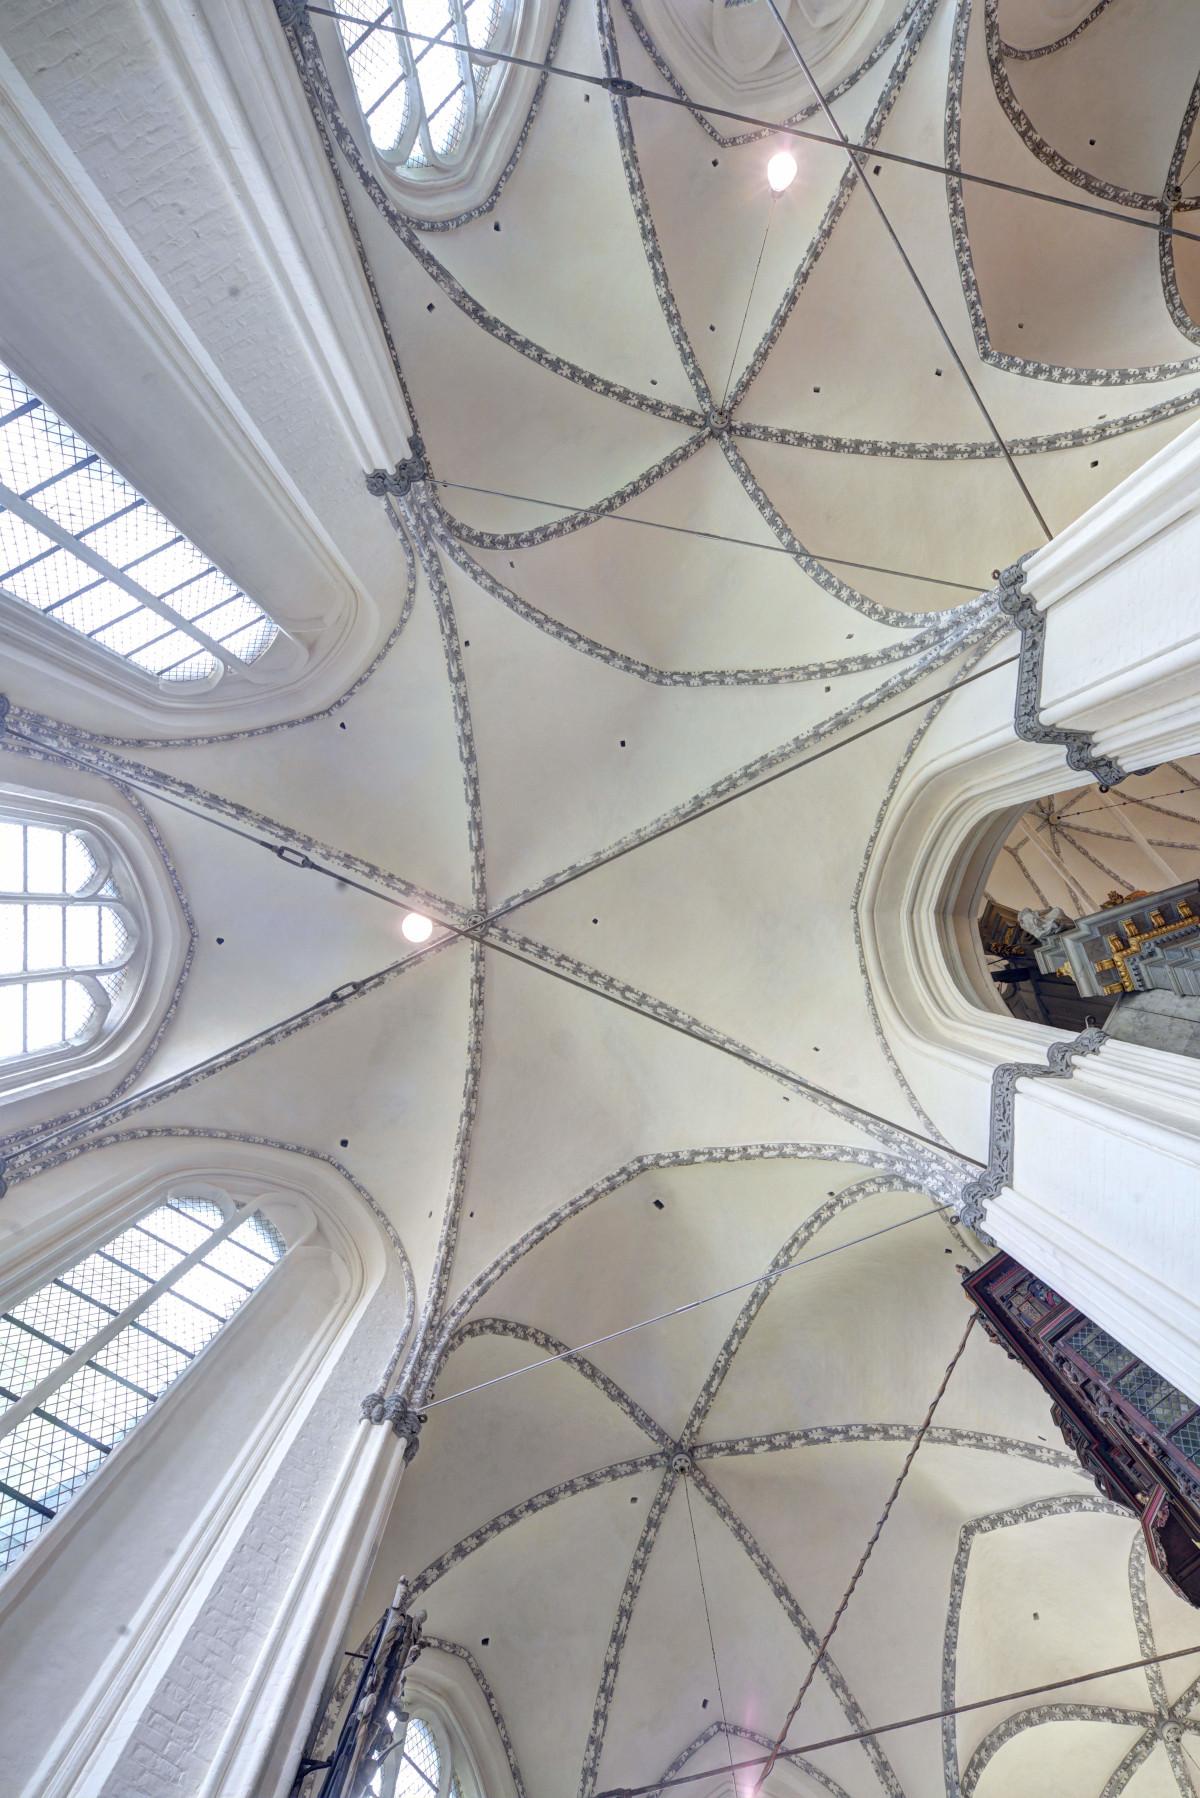 St.-Marien-Kirche, Blick in das Gewölbe des Chorumgangs